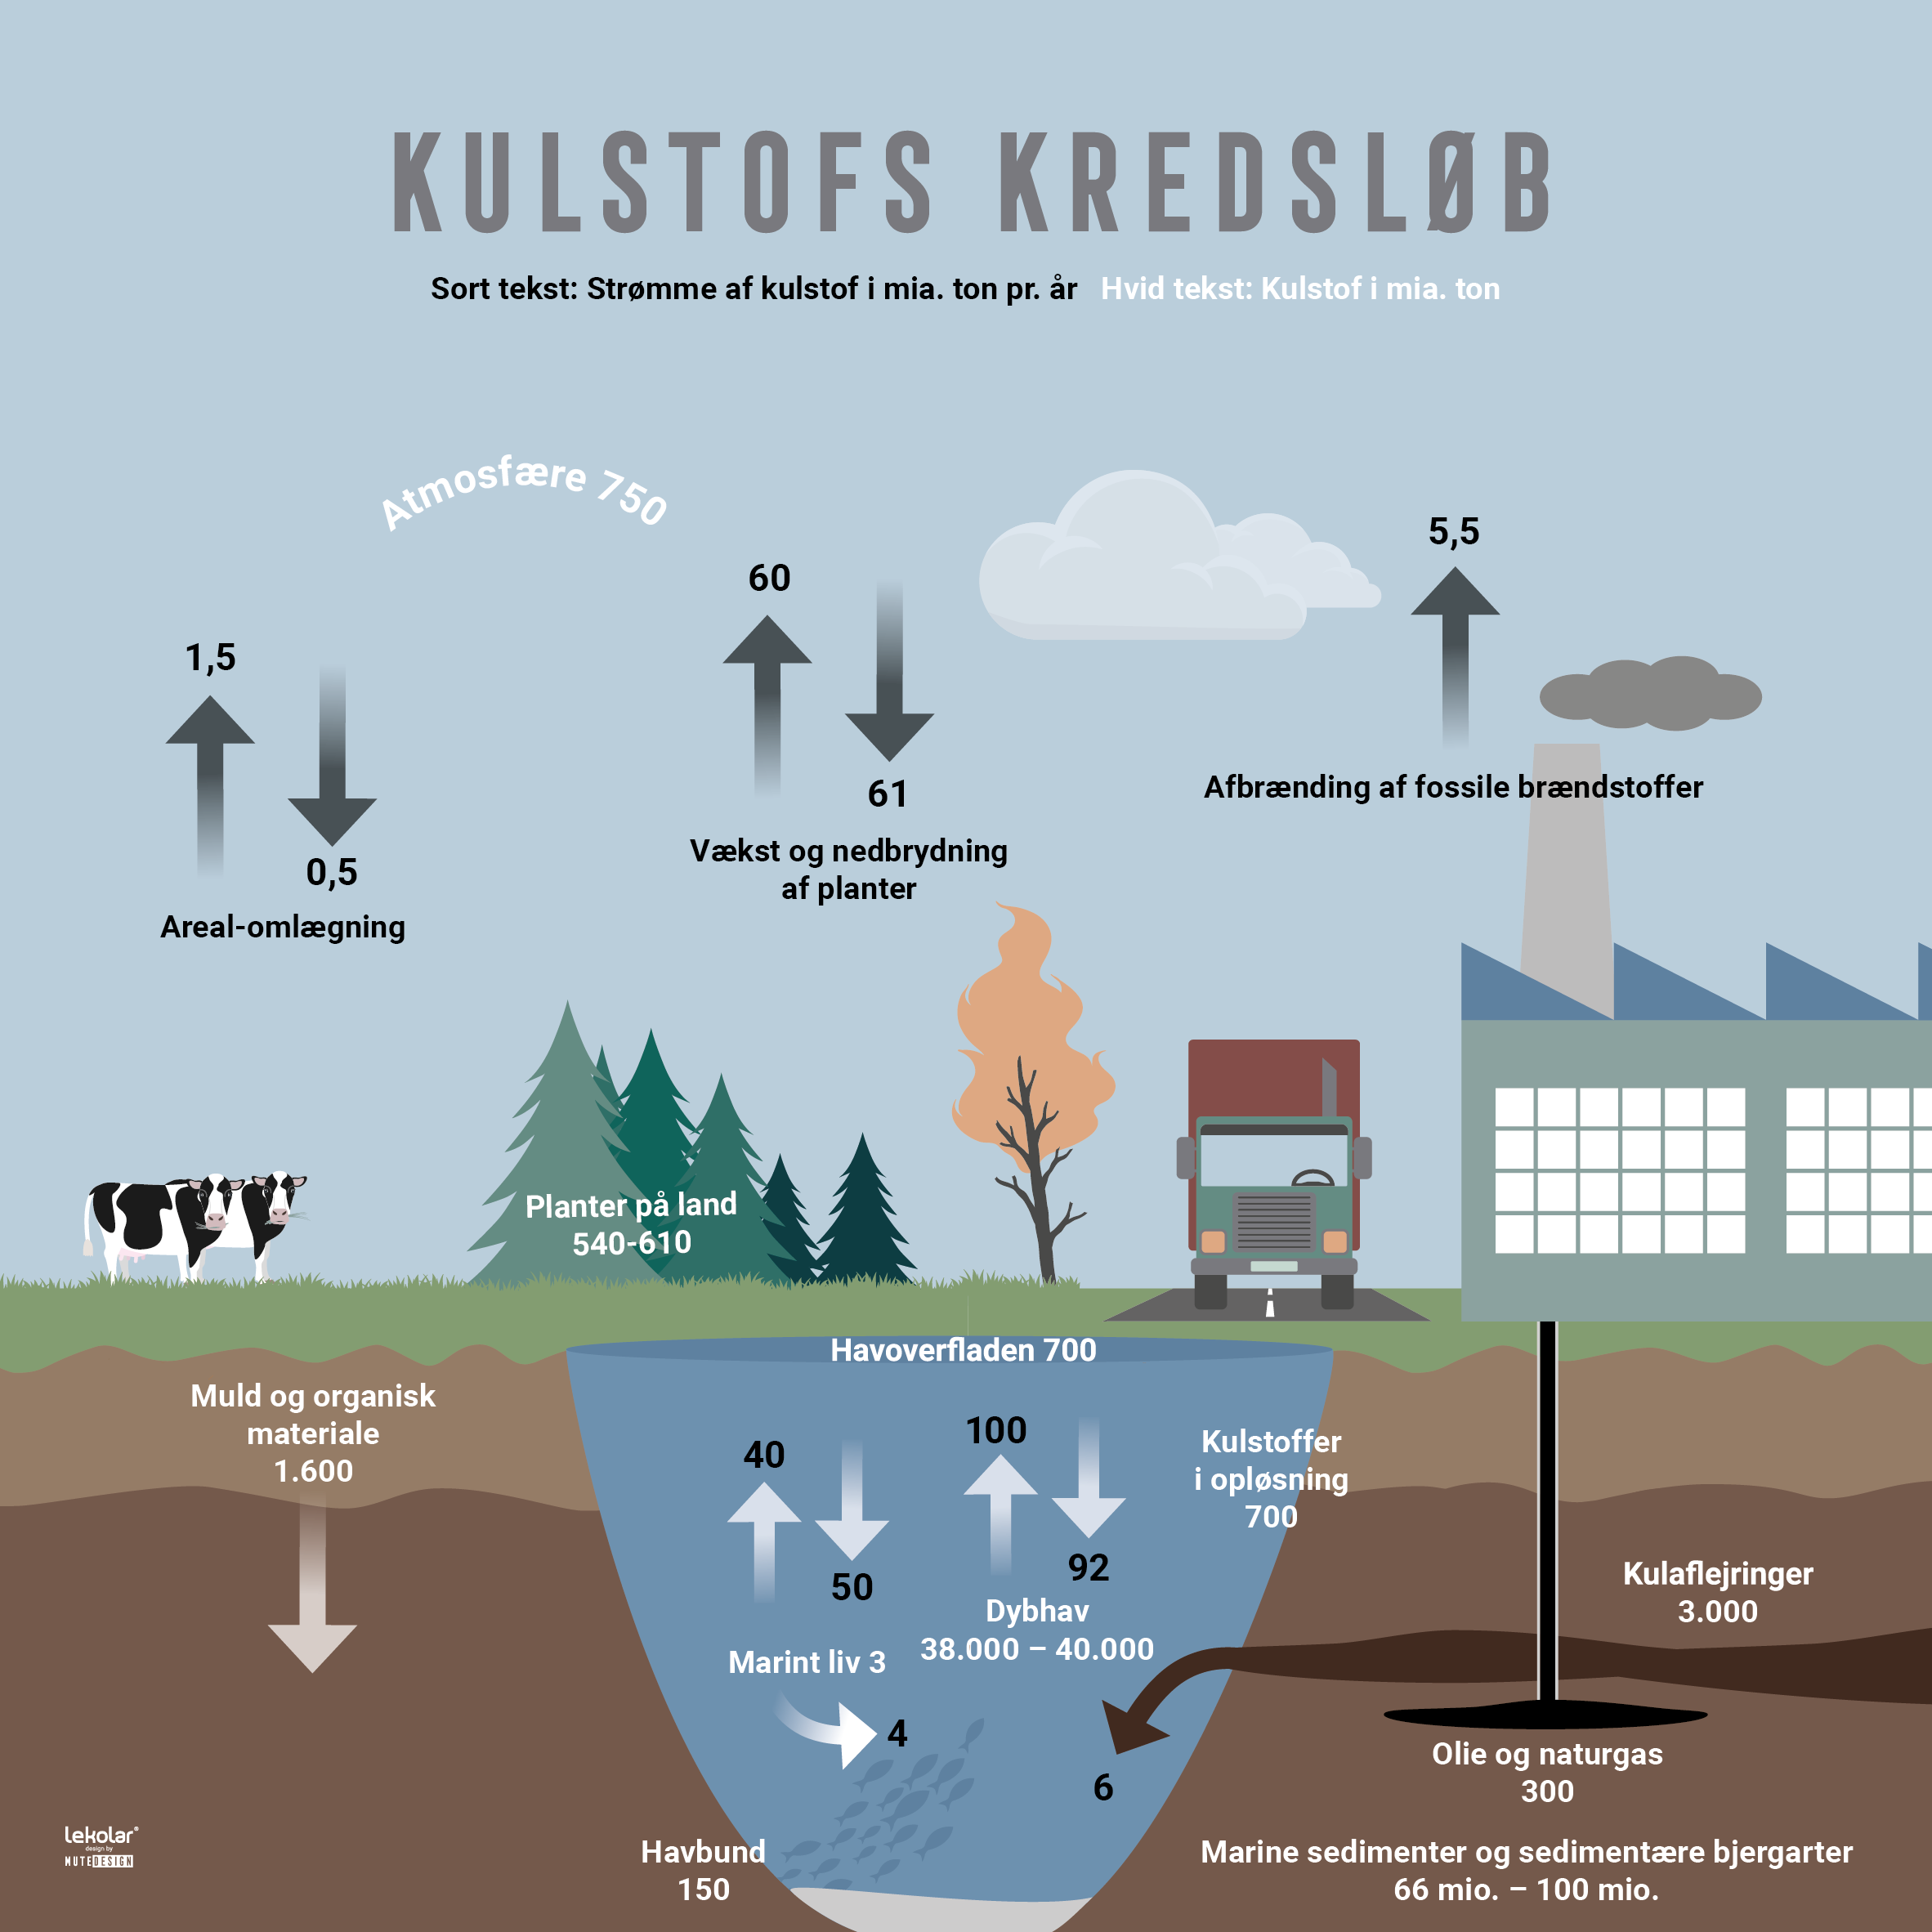 Kulstof-kredsloeb-fysik-naturfag-motiv-mutedesign